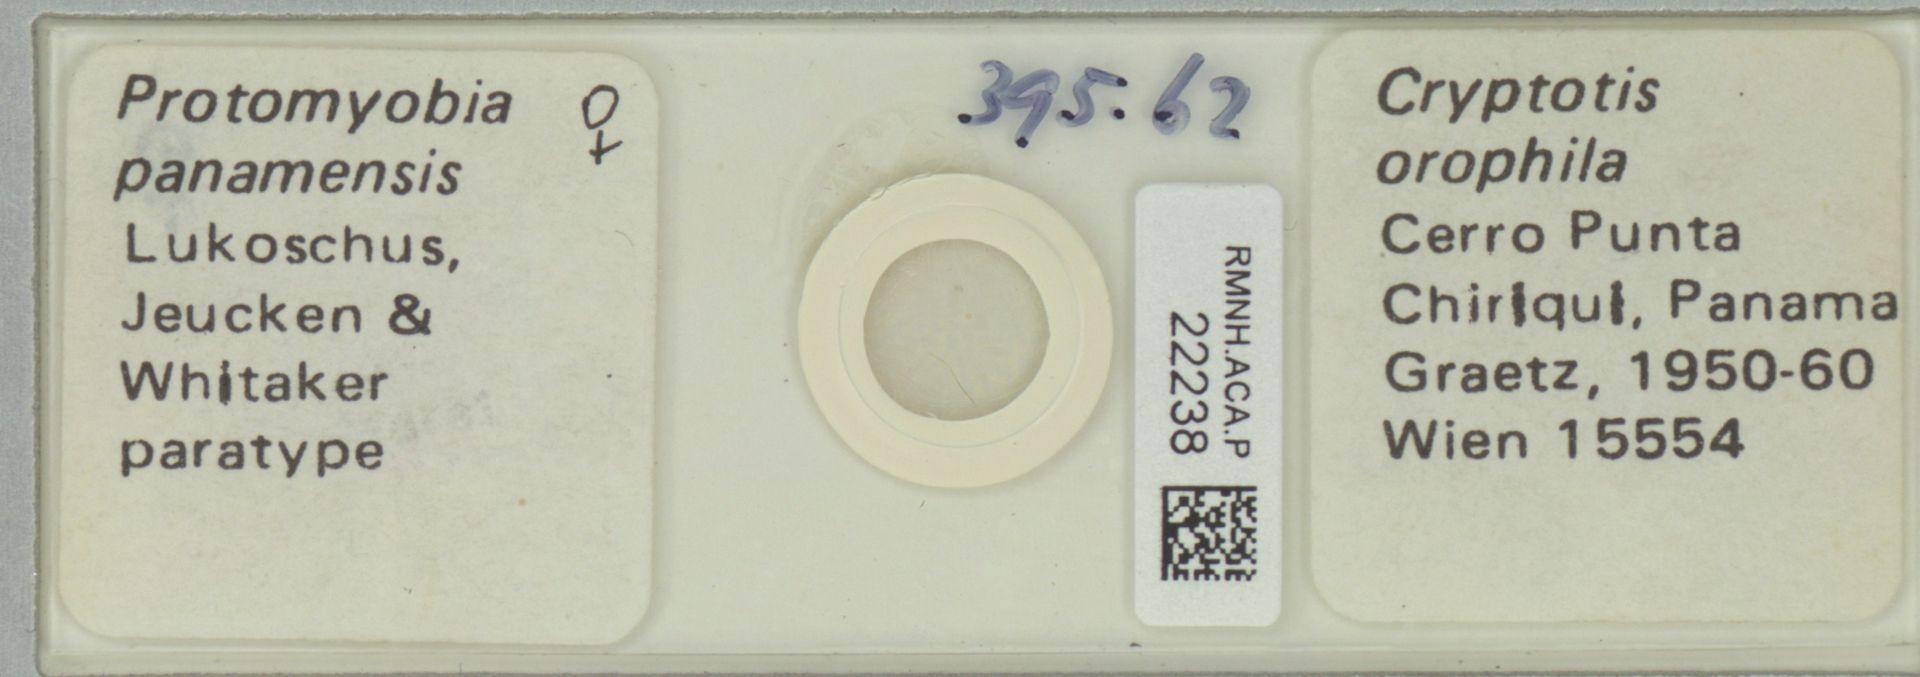 RMNH.ACA.P.22238 | Protomyobia panamensis Lukoschus, Jeucken & Whitaker